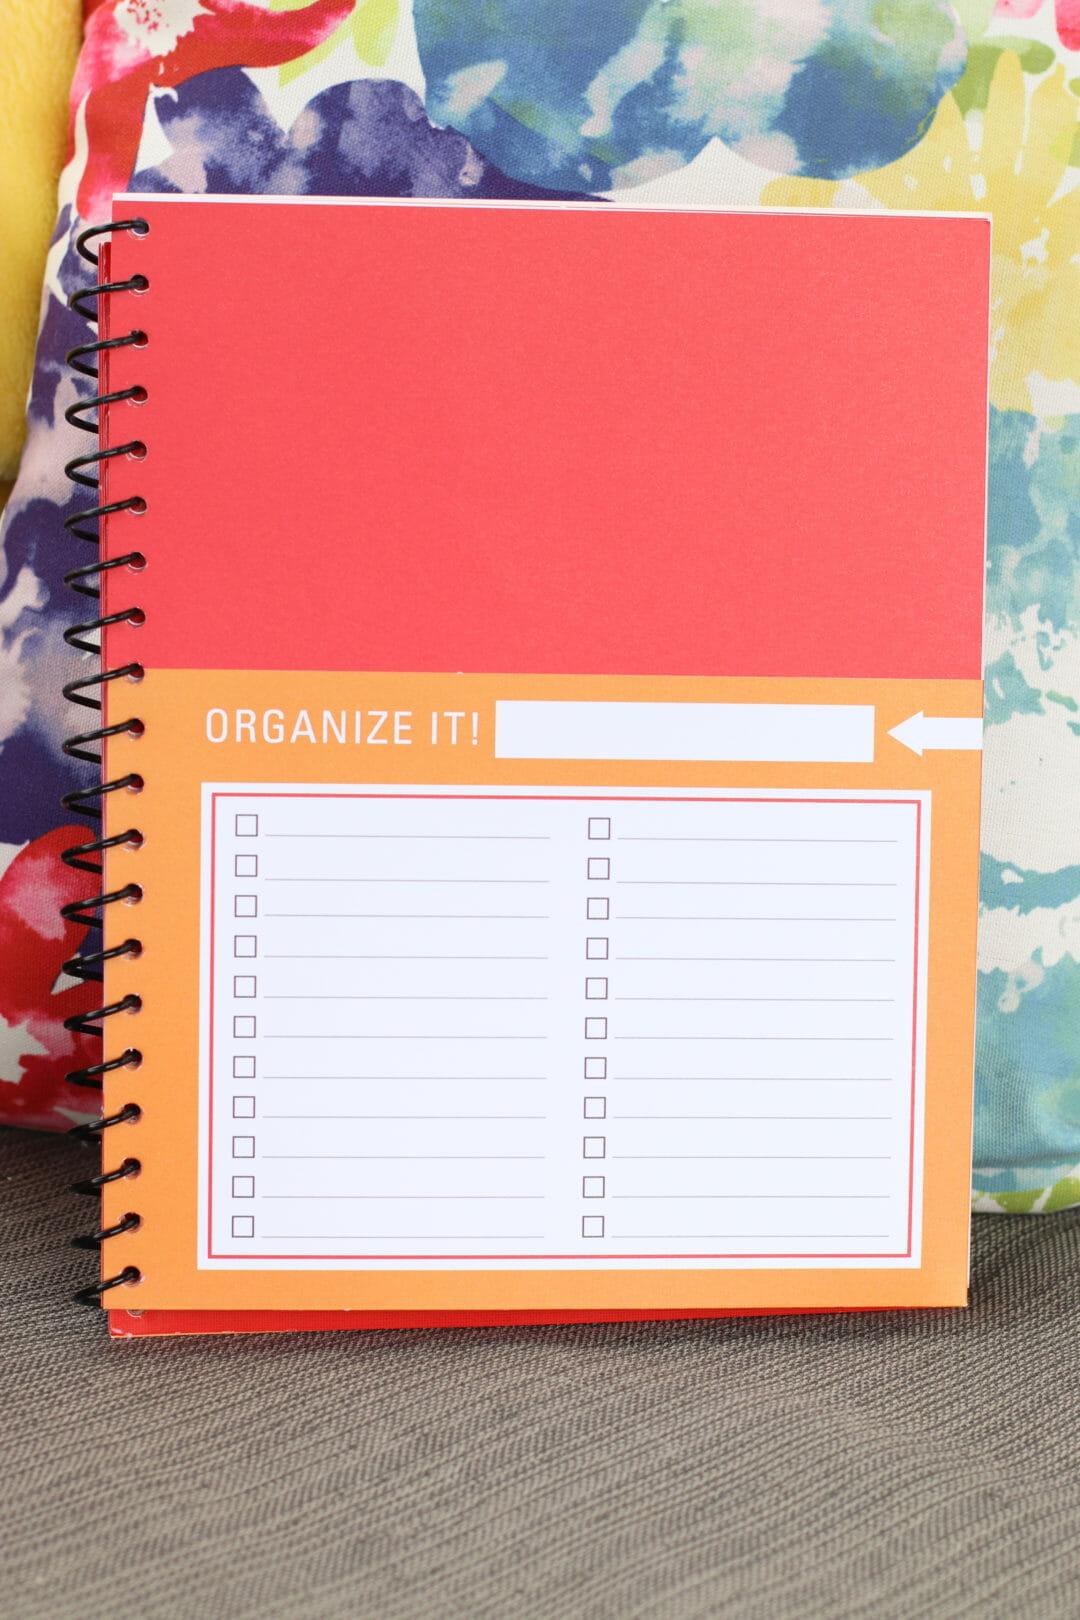 Stuff I Need to Organize Book